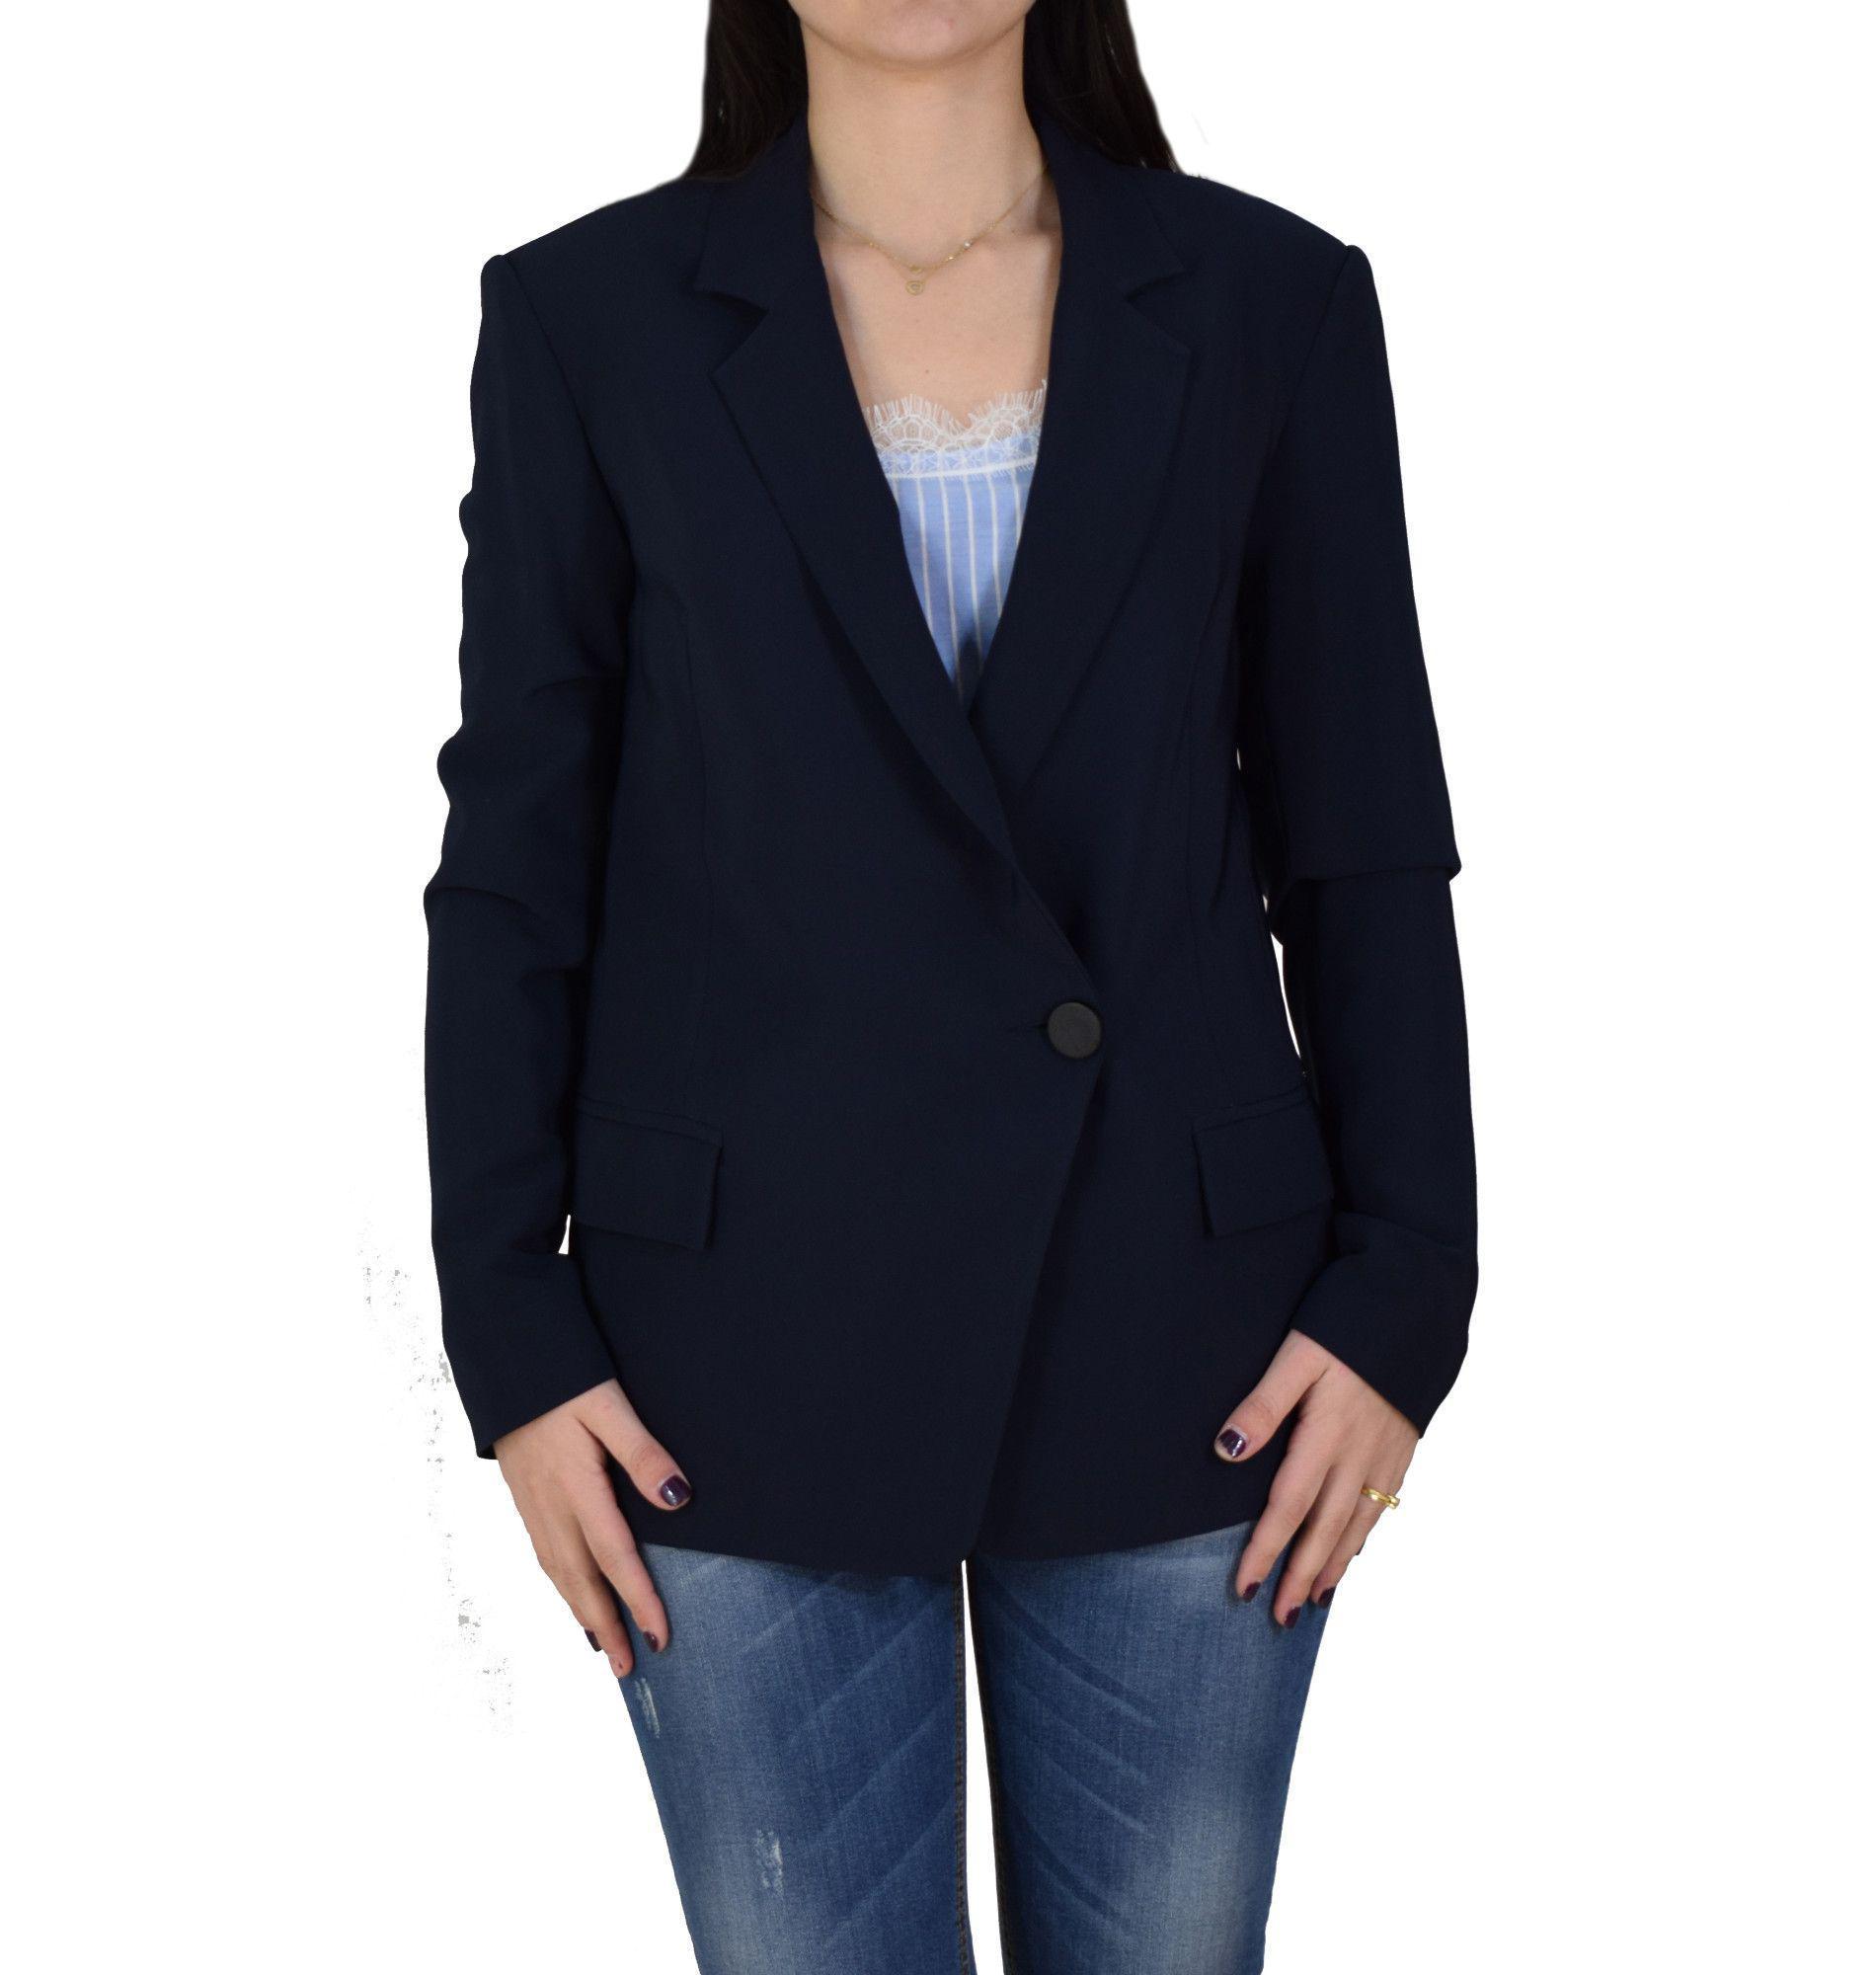 af19c0a56d94 Γυναικείο Σακάκι Toi   Moi 40-0436-19 Μπλε